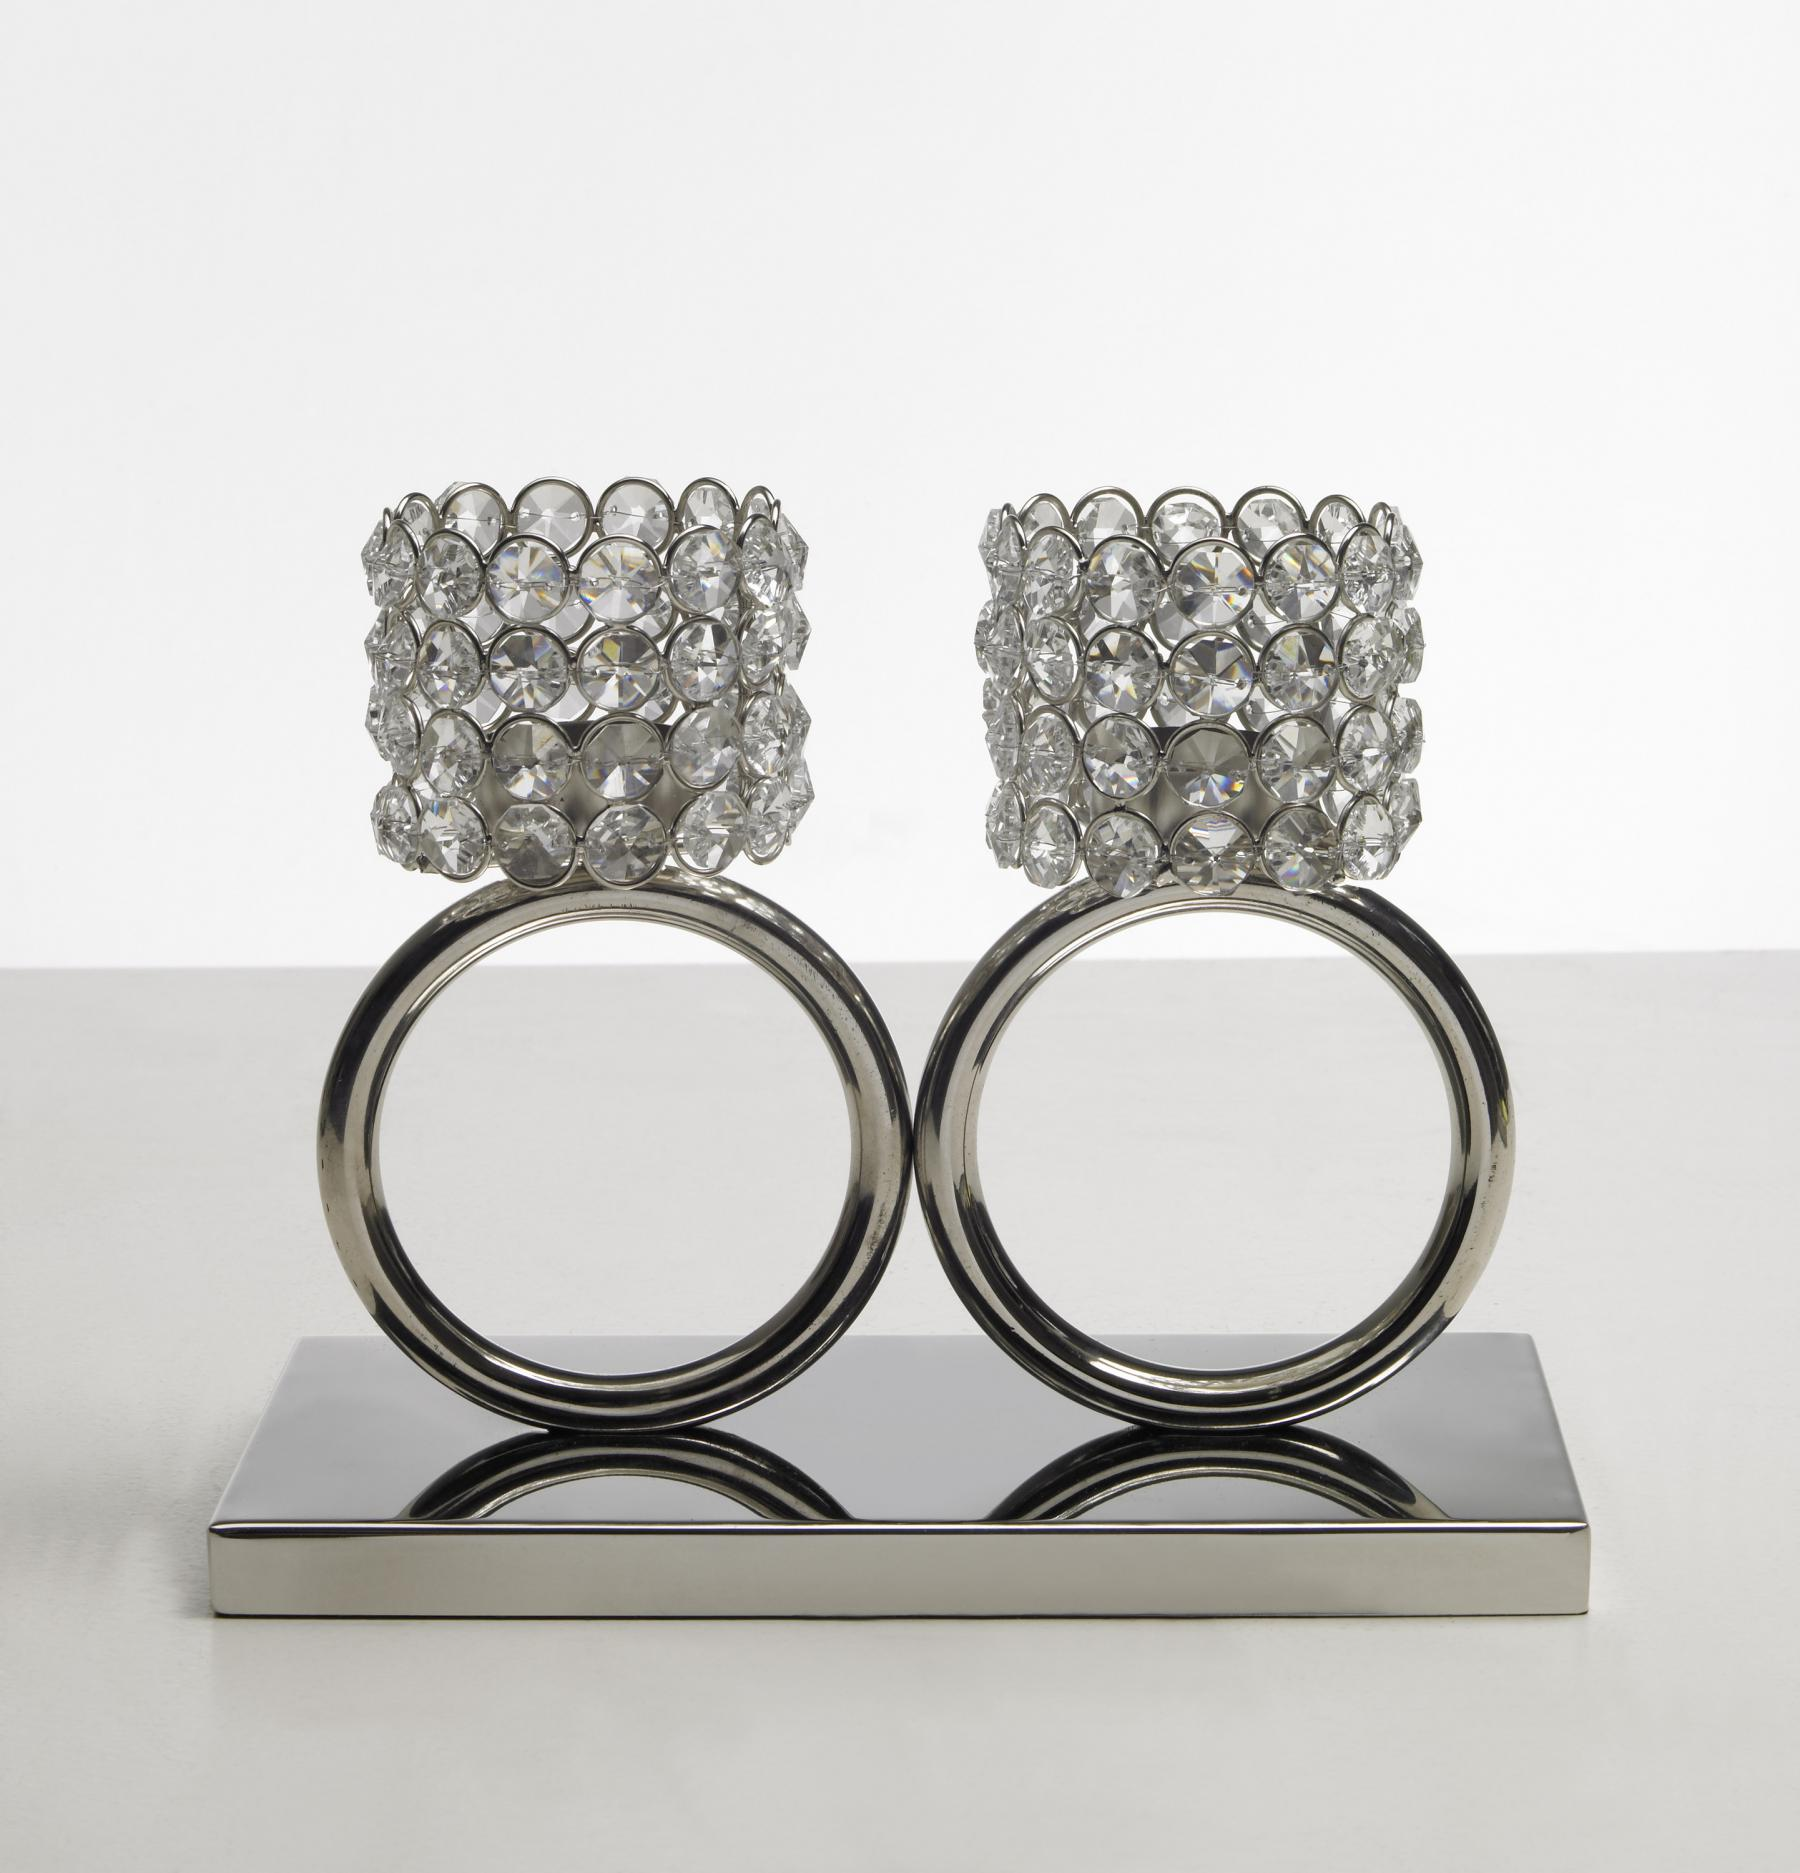 kristall kerzenst nder teelichthalter louise 2 ring. Black Bedroom Furniture Sets. Home Design Ideas